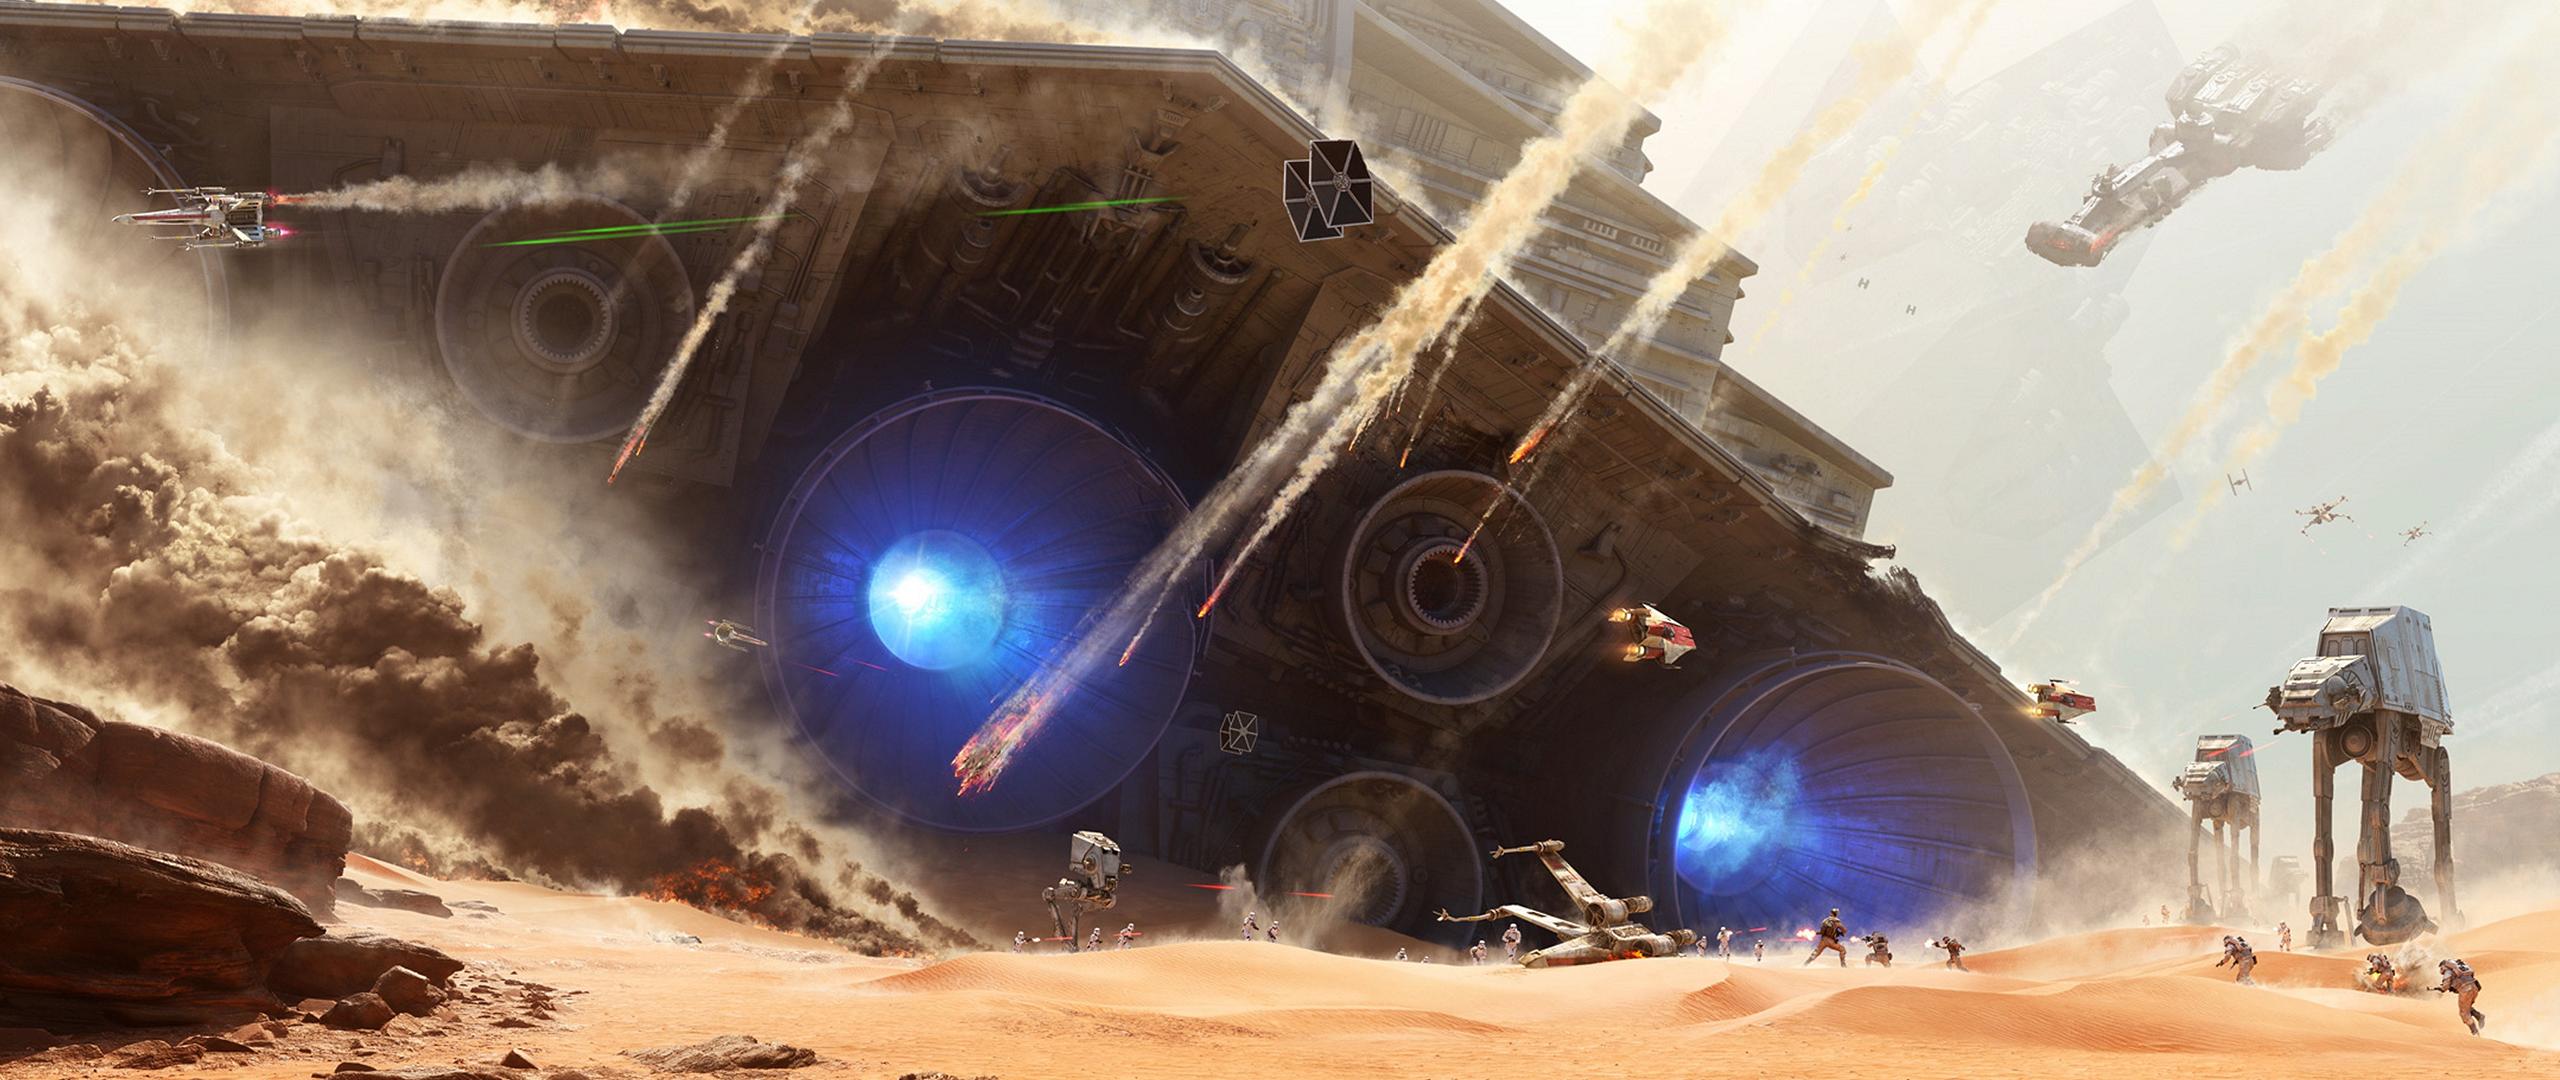 Wallpaper Star Wars Space Ultra Wide Screenshot Atmosphere Of Earth 2560x1080 Ludendorf 23382 Hd Wallpapers Wallhere